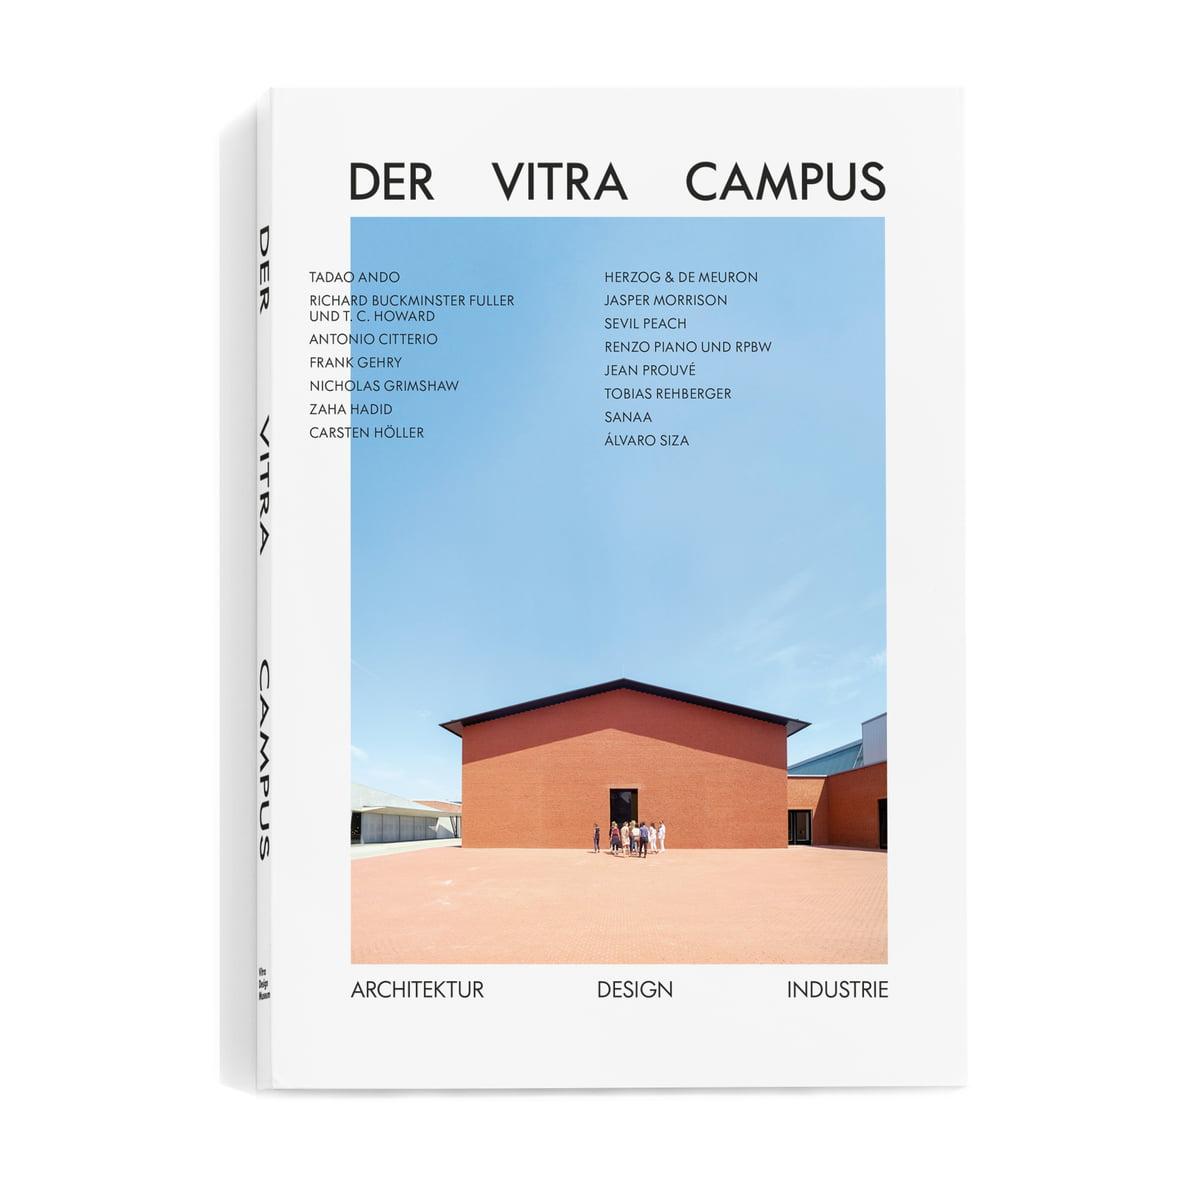 Vitra Design Museum - Le Vitra Campus (Nouvelle Edition 2016)